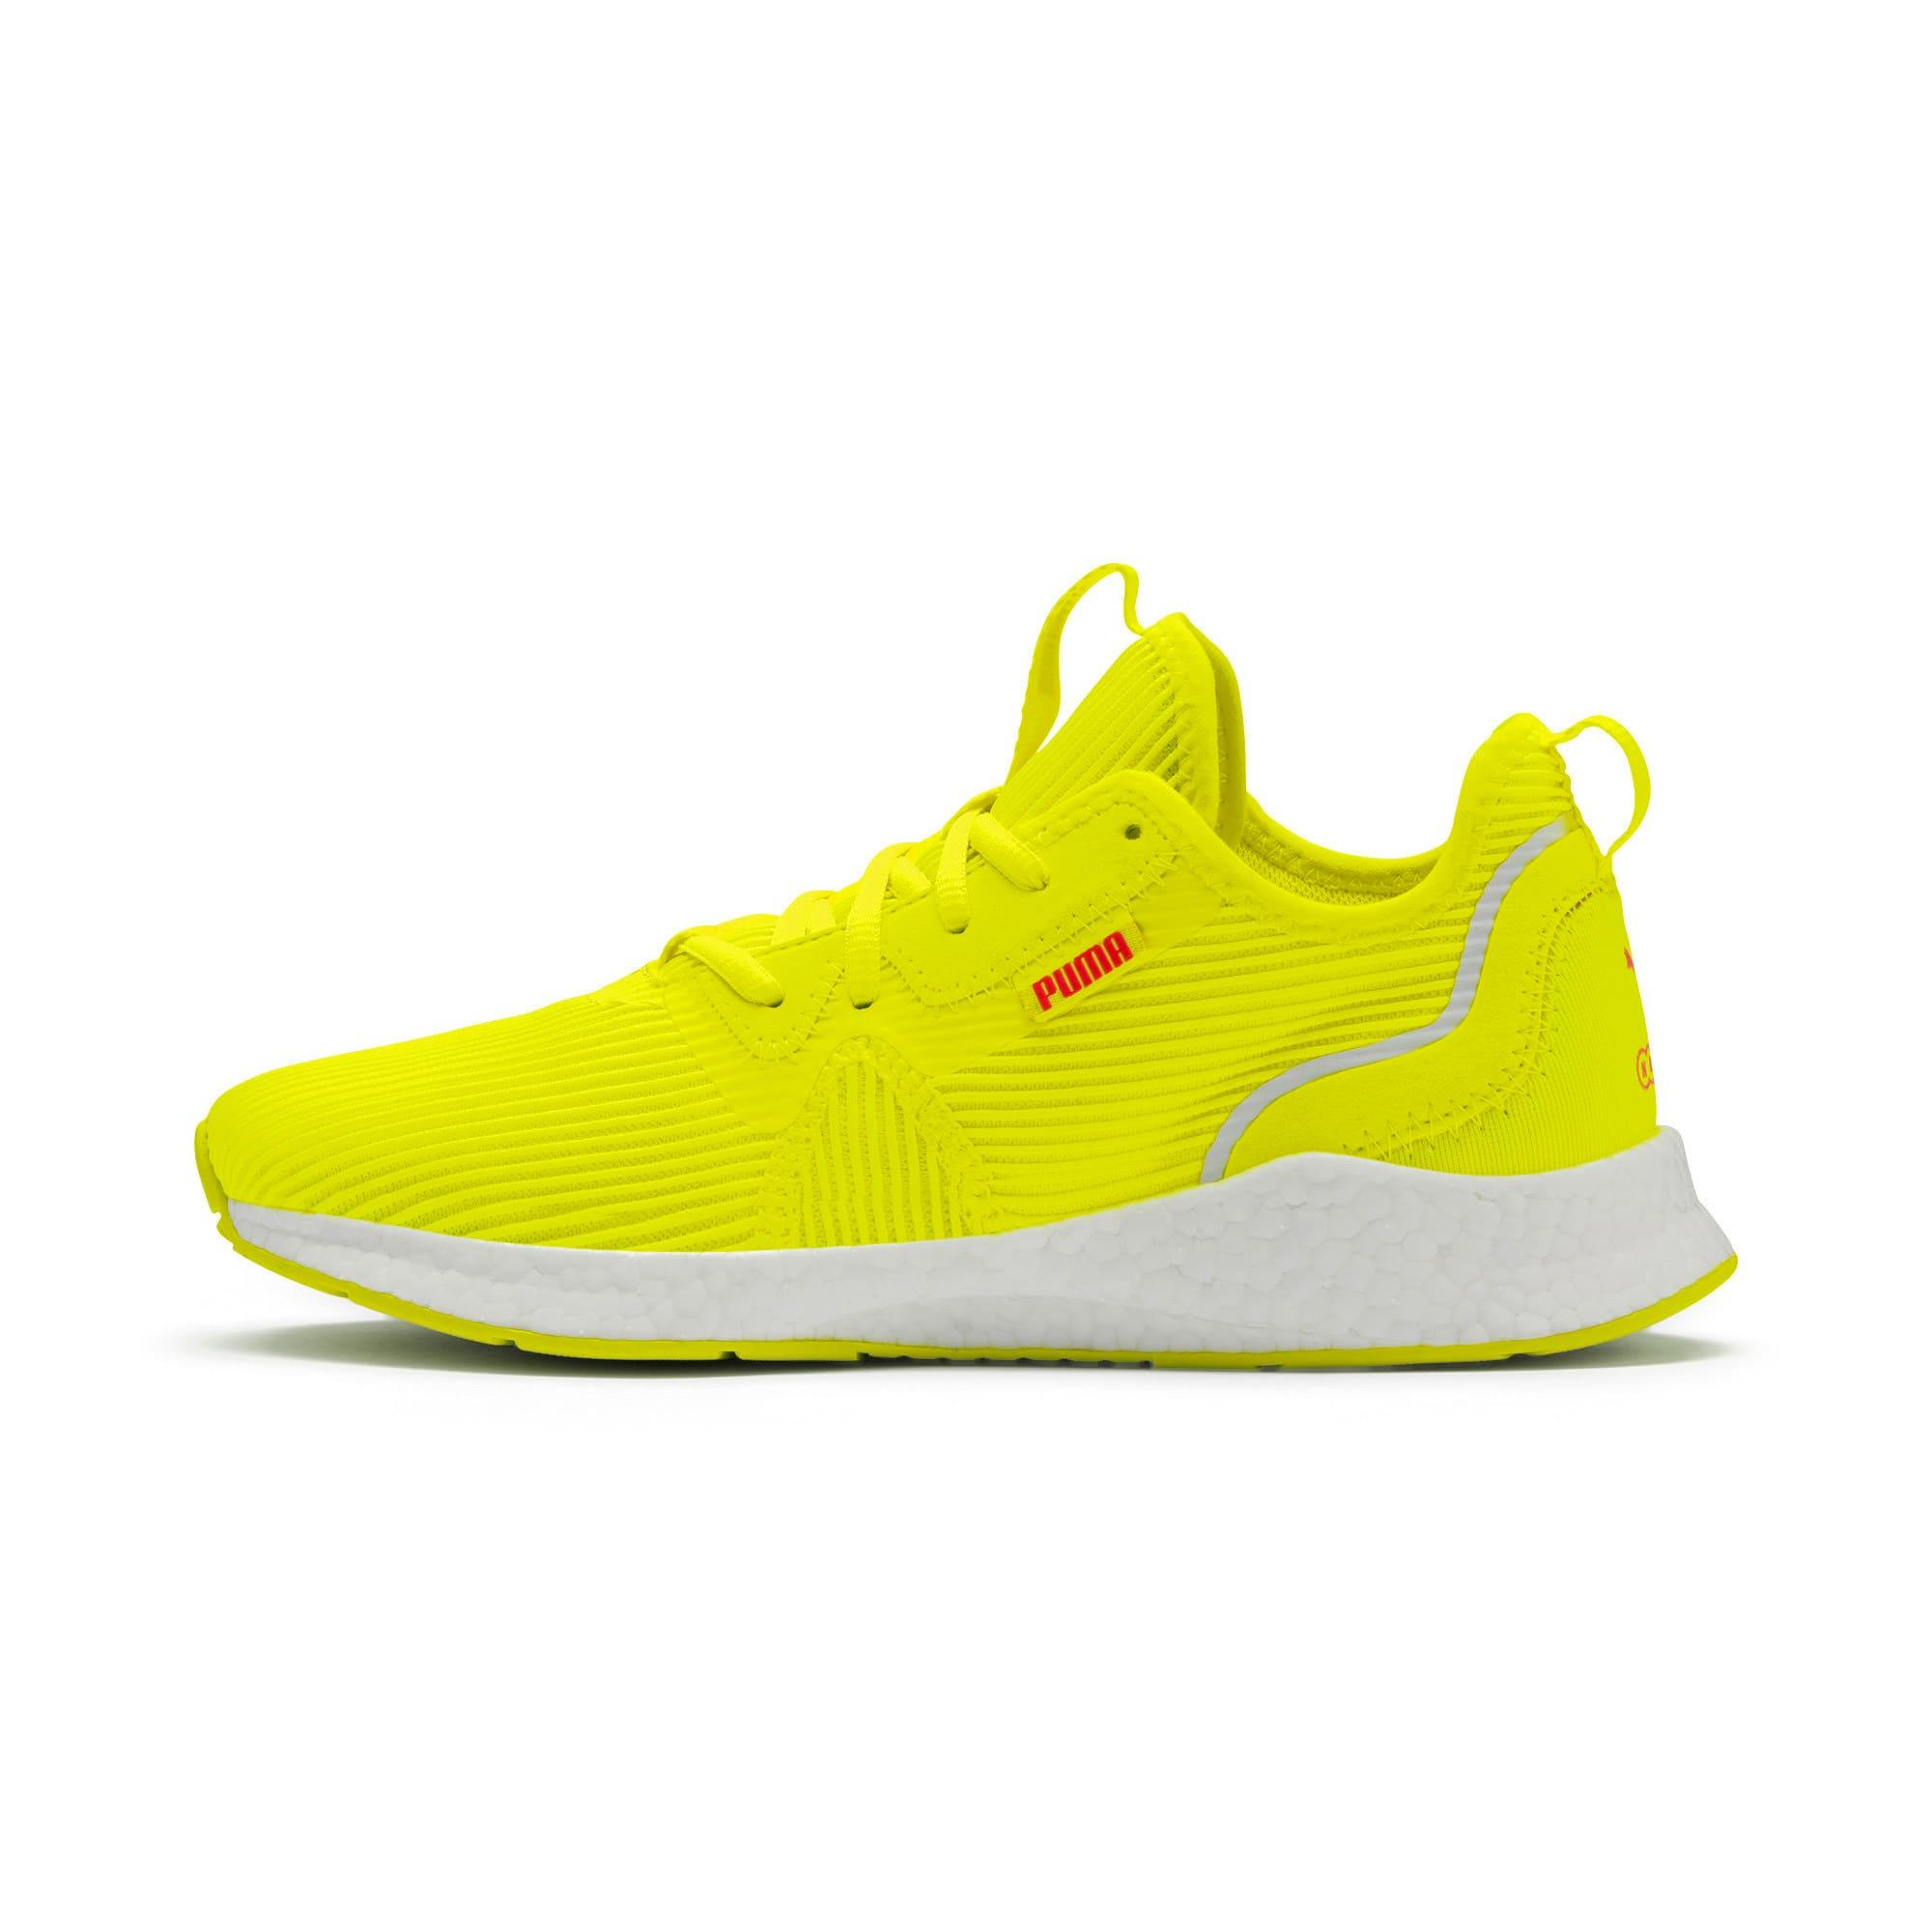 Miniatura 1 de Zapatos para correr NRGY Star Femme para mujer, Yellow Alert-Pink Alert, mediano